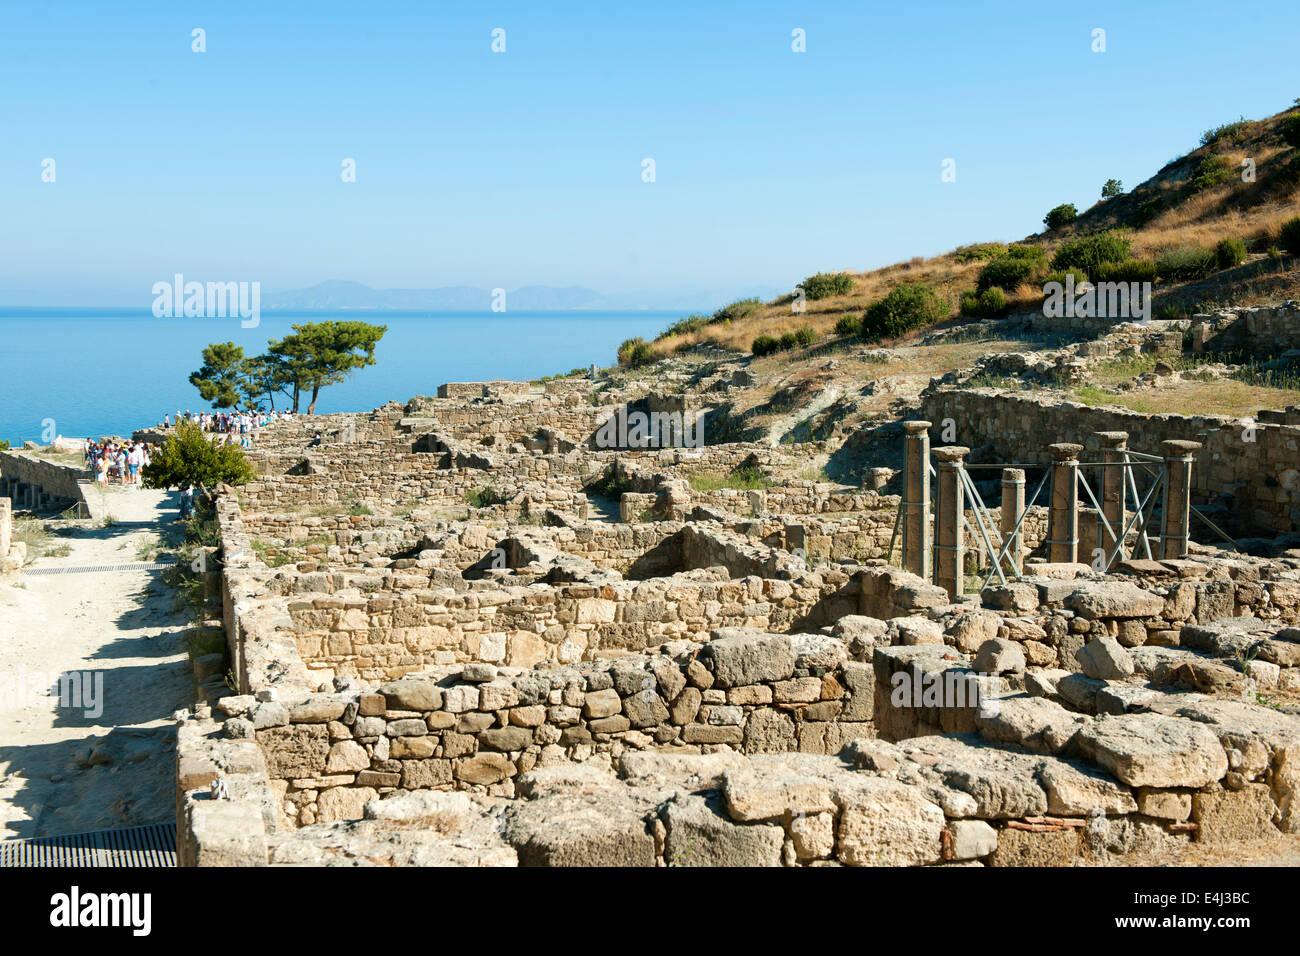 Griechenland, Rhodos, Kamires (Kamirou) - Stock Image